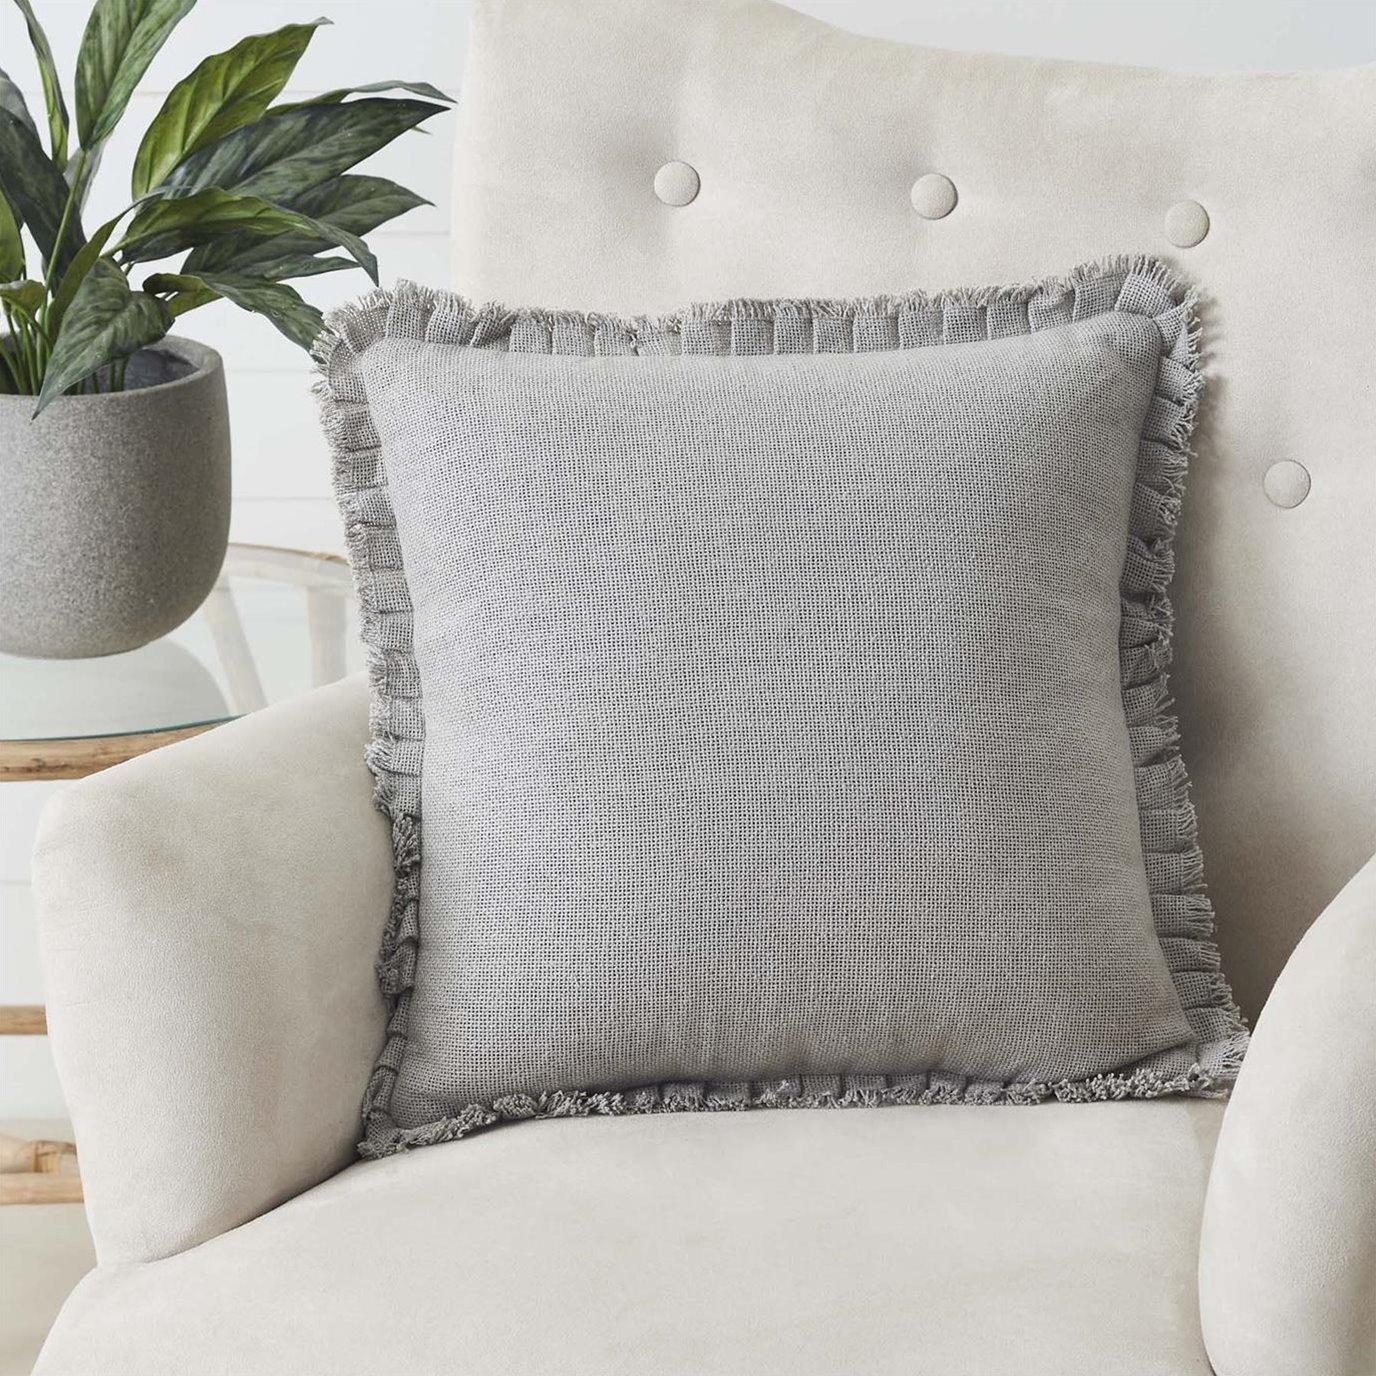 Burlap Dove Grey Pillow w/ Fringed Ruffle 18x18